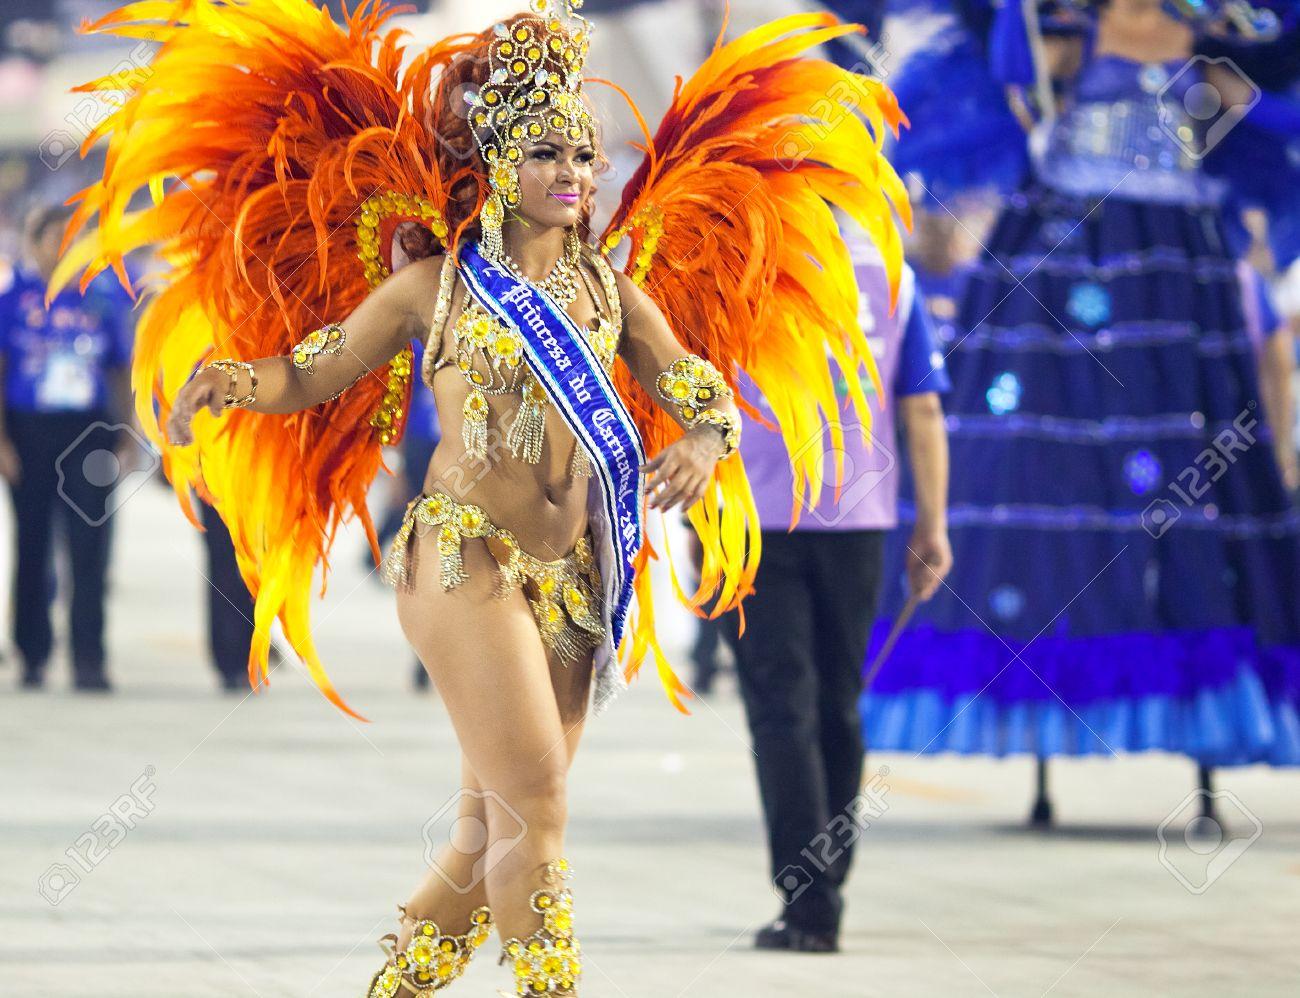 RIO DE JANEIRO , FEBRUARY 10 A woman in costume dancing on carnival at Sambodromo